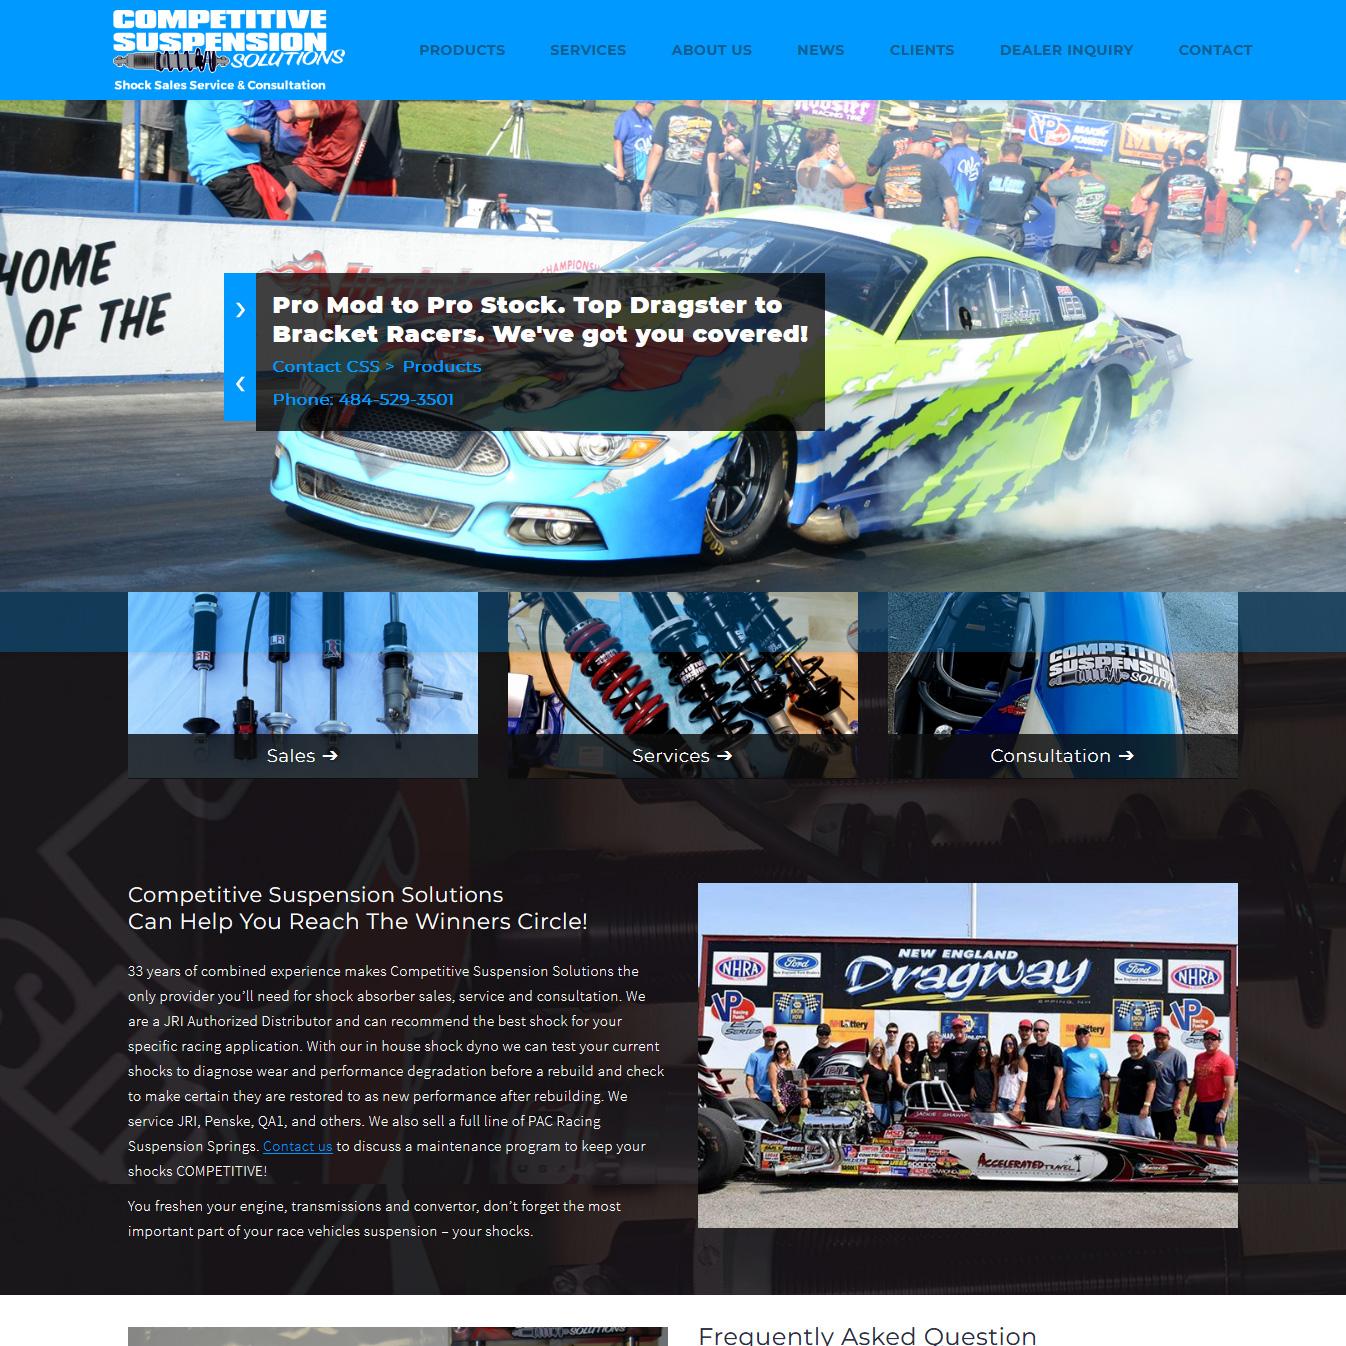 Competitive Suspension Solutions drag racing shock absorber website design